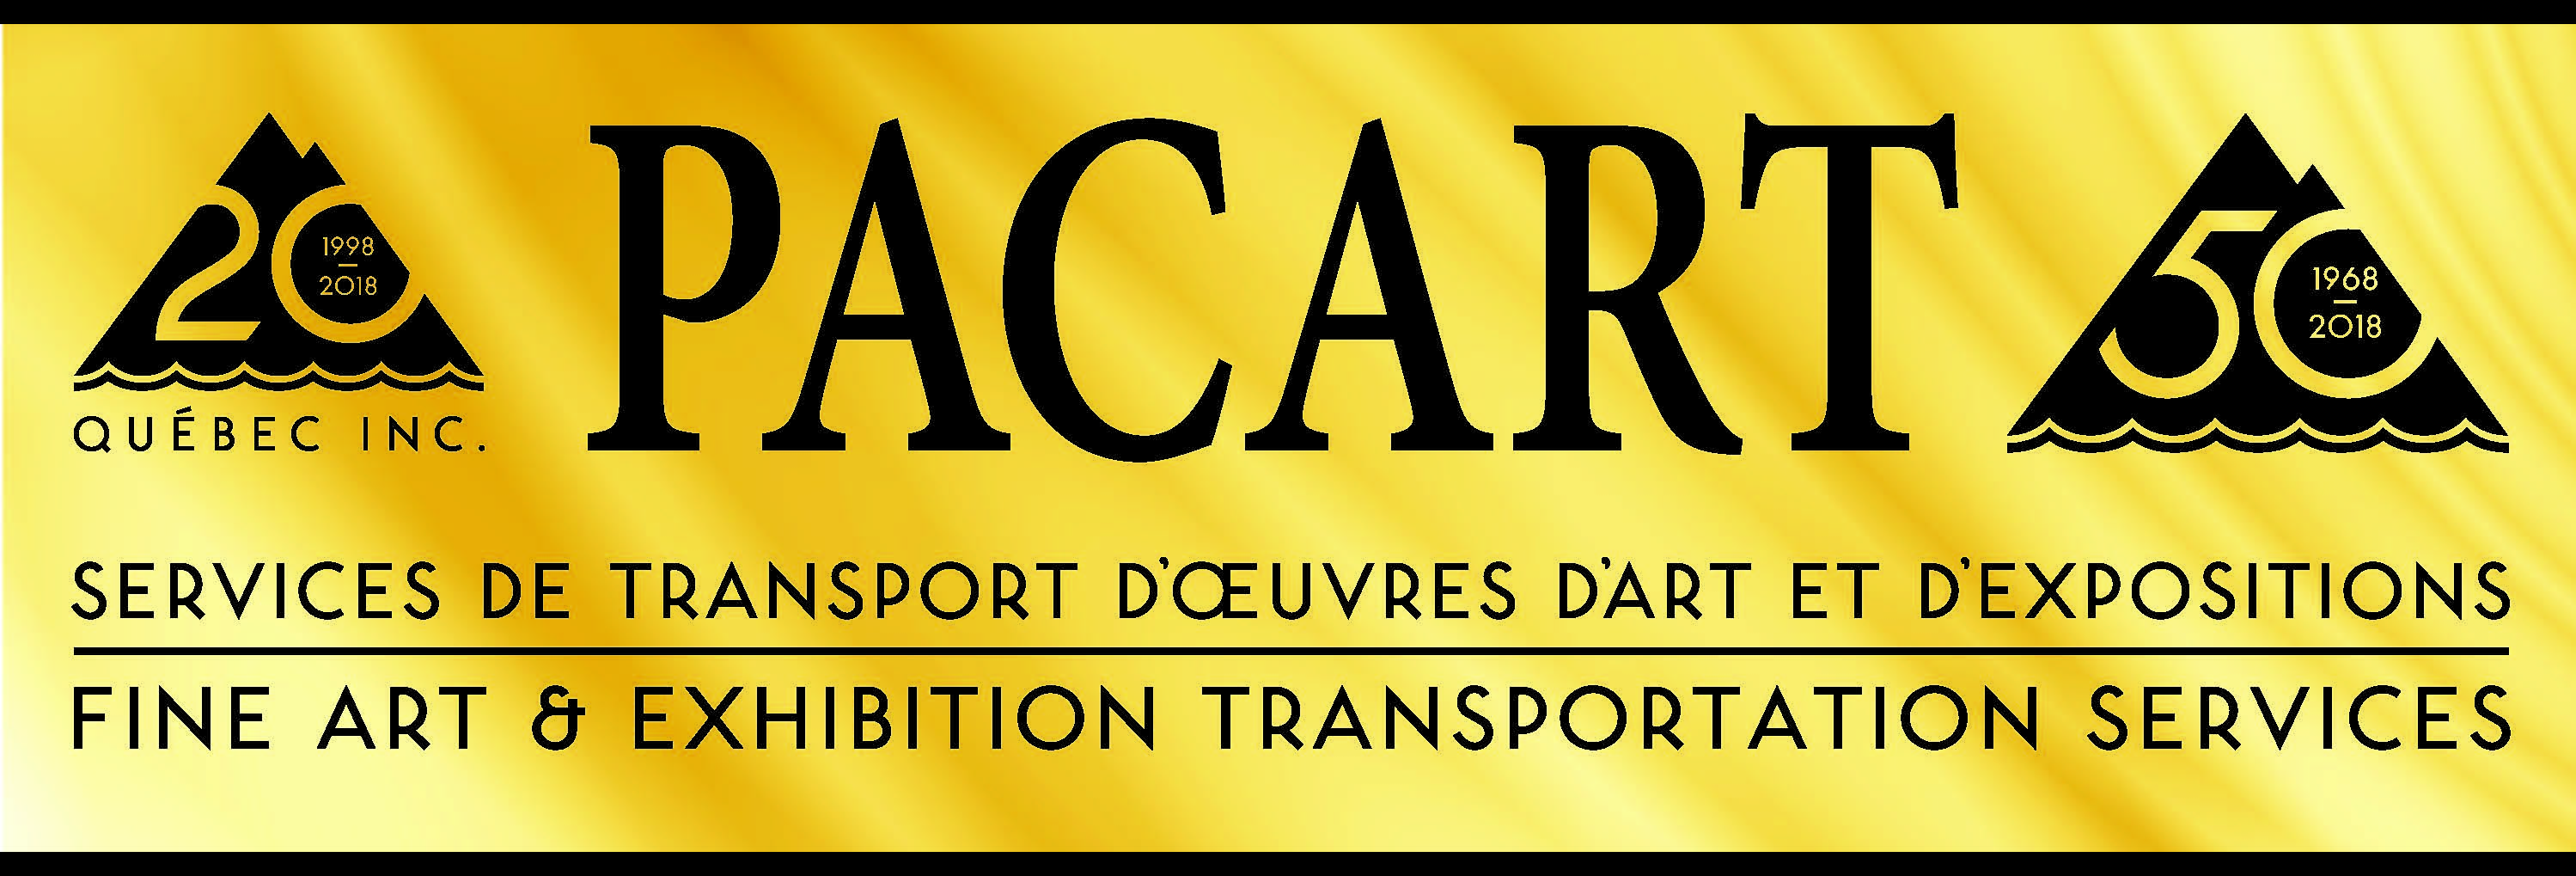 Pacart logo gold 50